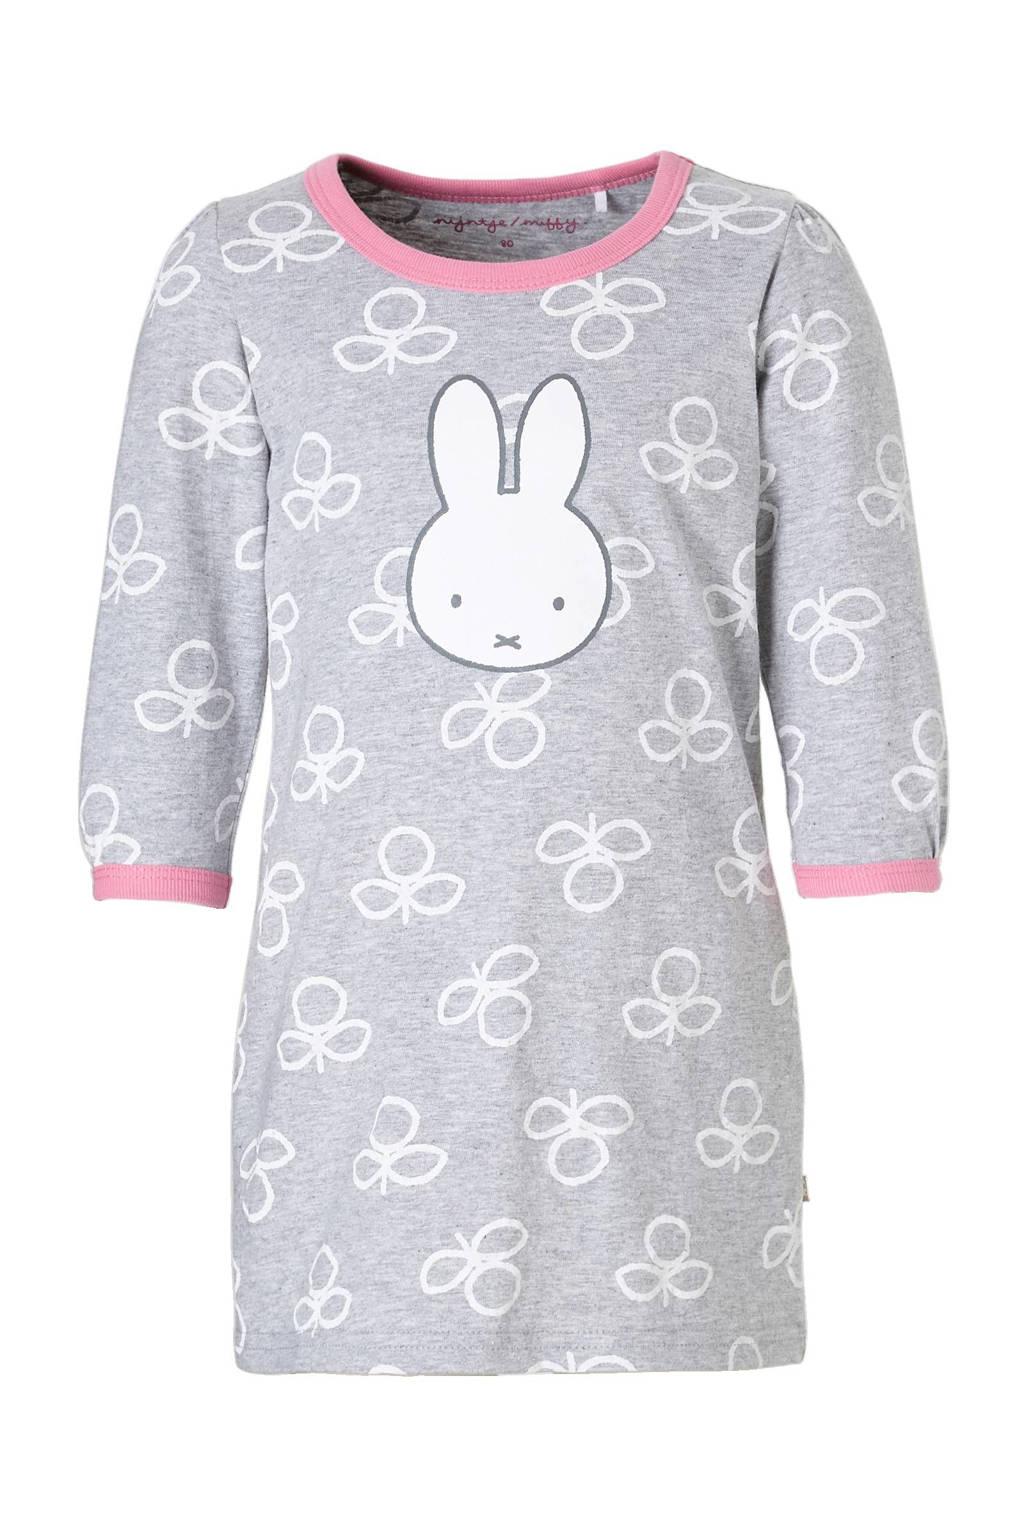 nijntje nachthemd grijs, Grijs/wit/roze